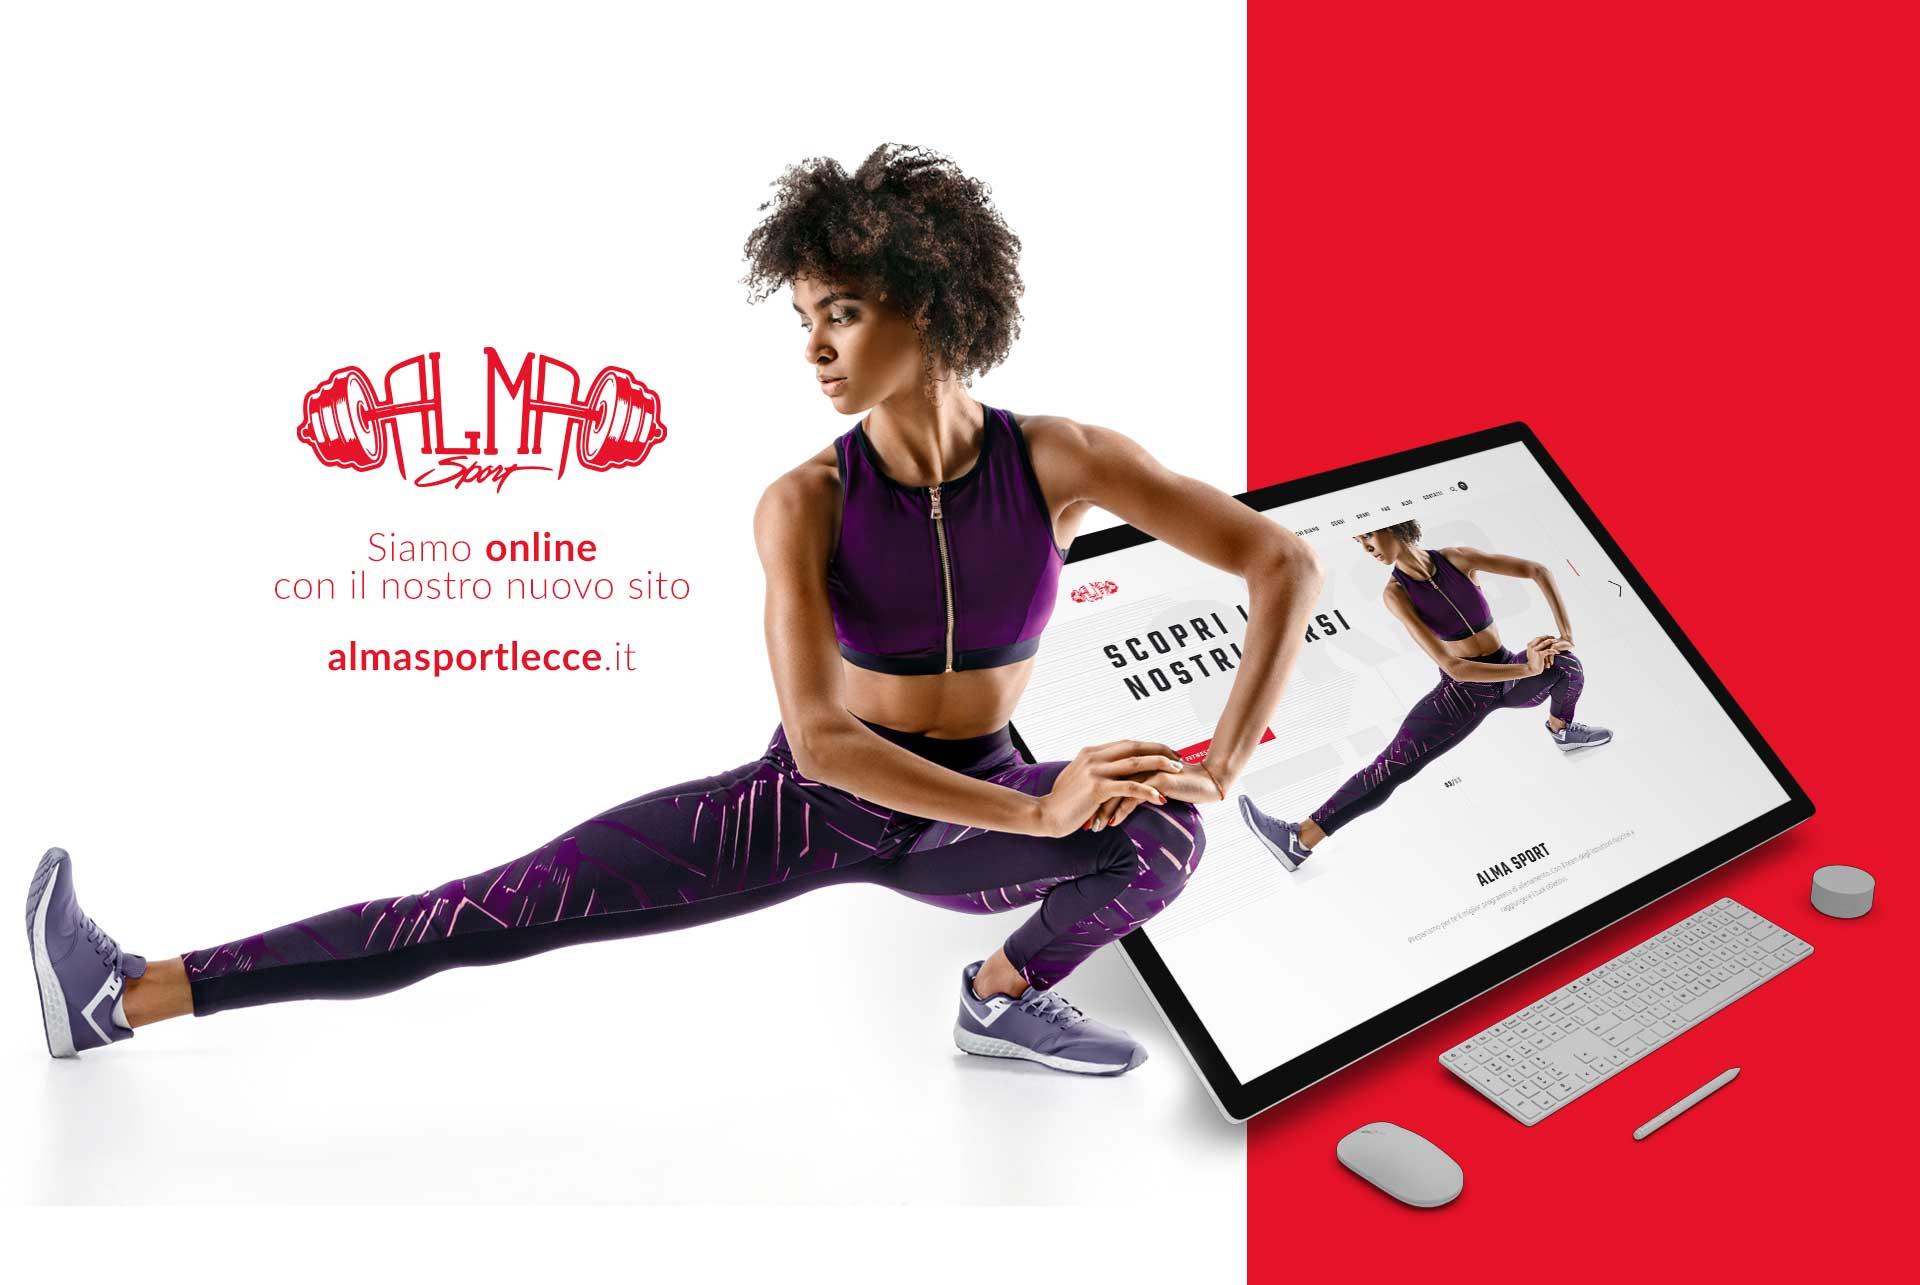 alma sport online sito palestra